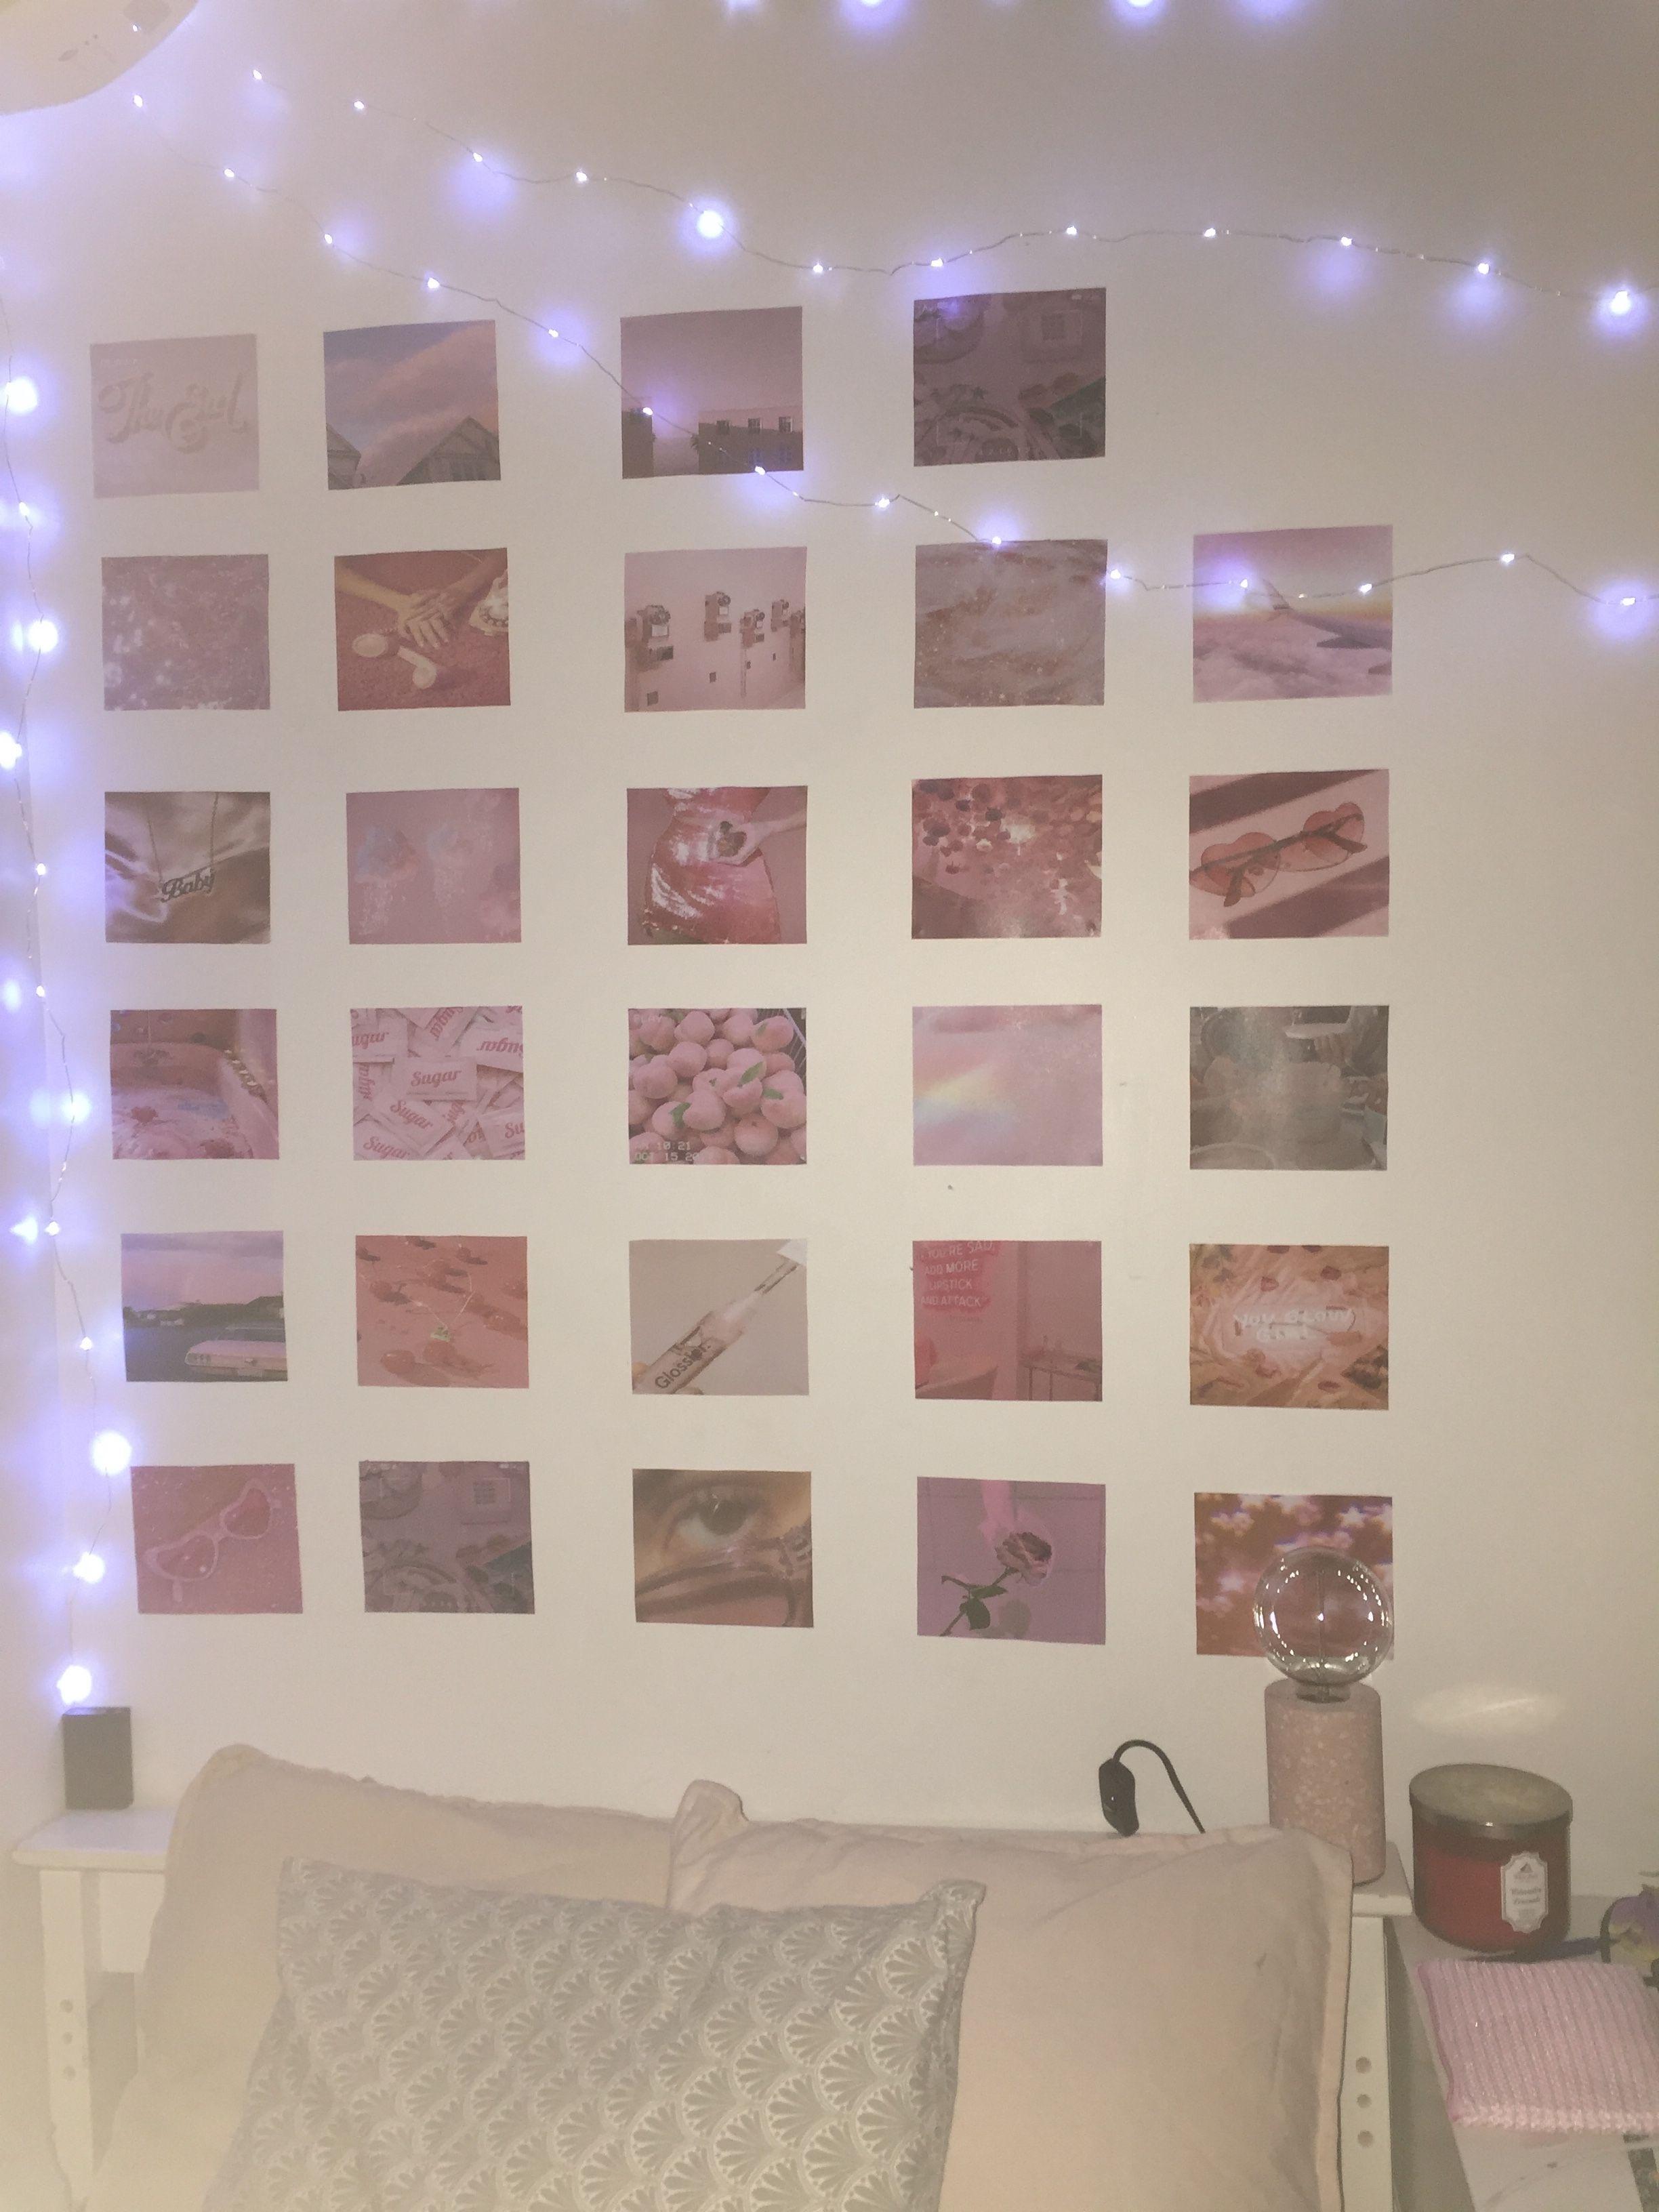 Aesthetic Pink Photo Bedroom Wall Pink Bedroom Decor Pink Bedroom Walls Photo Walls Bedroom